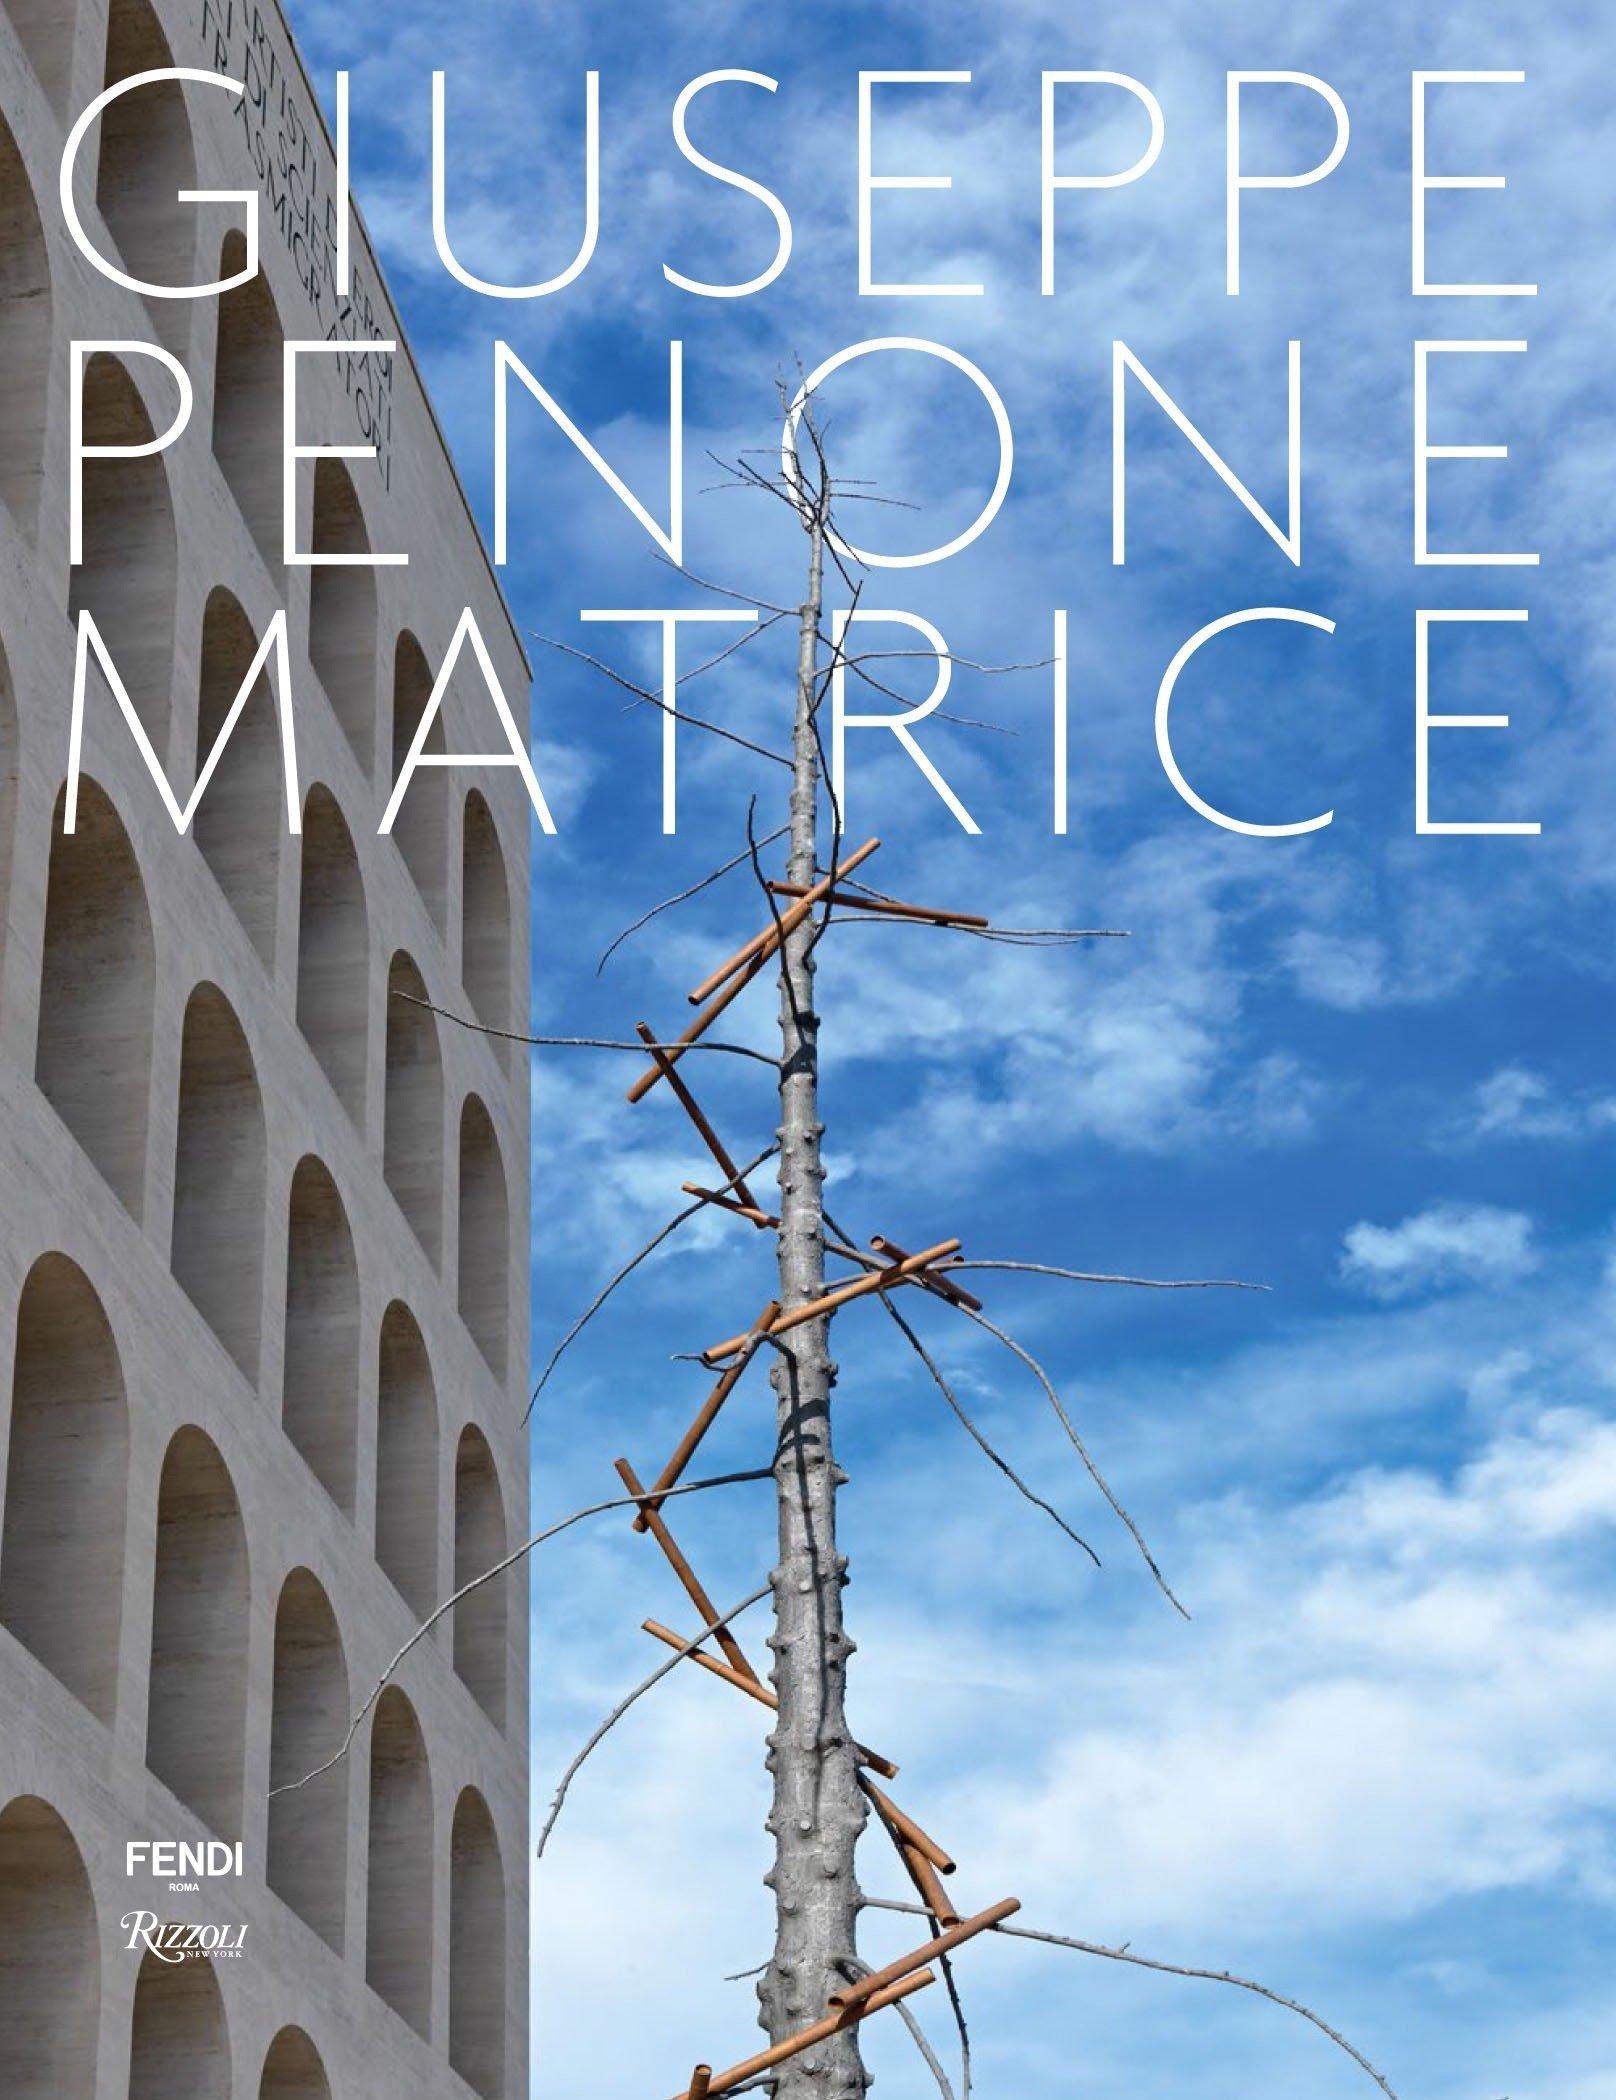 Giuseppe Penone: Matrice pdf